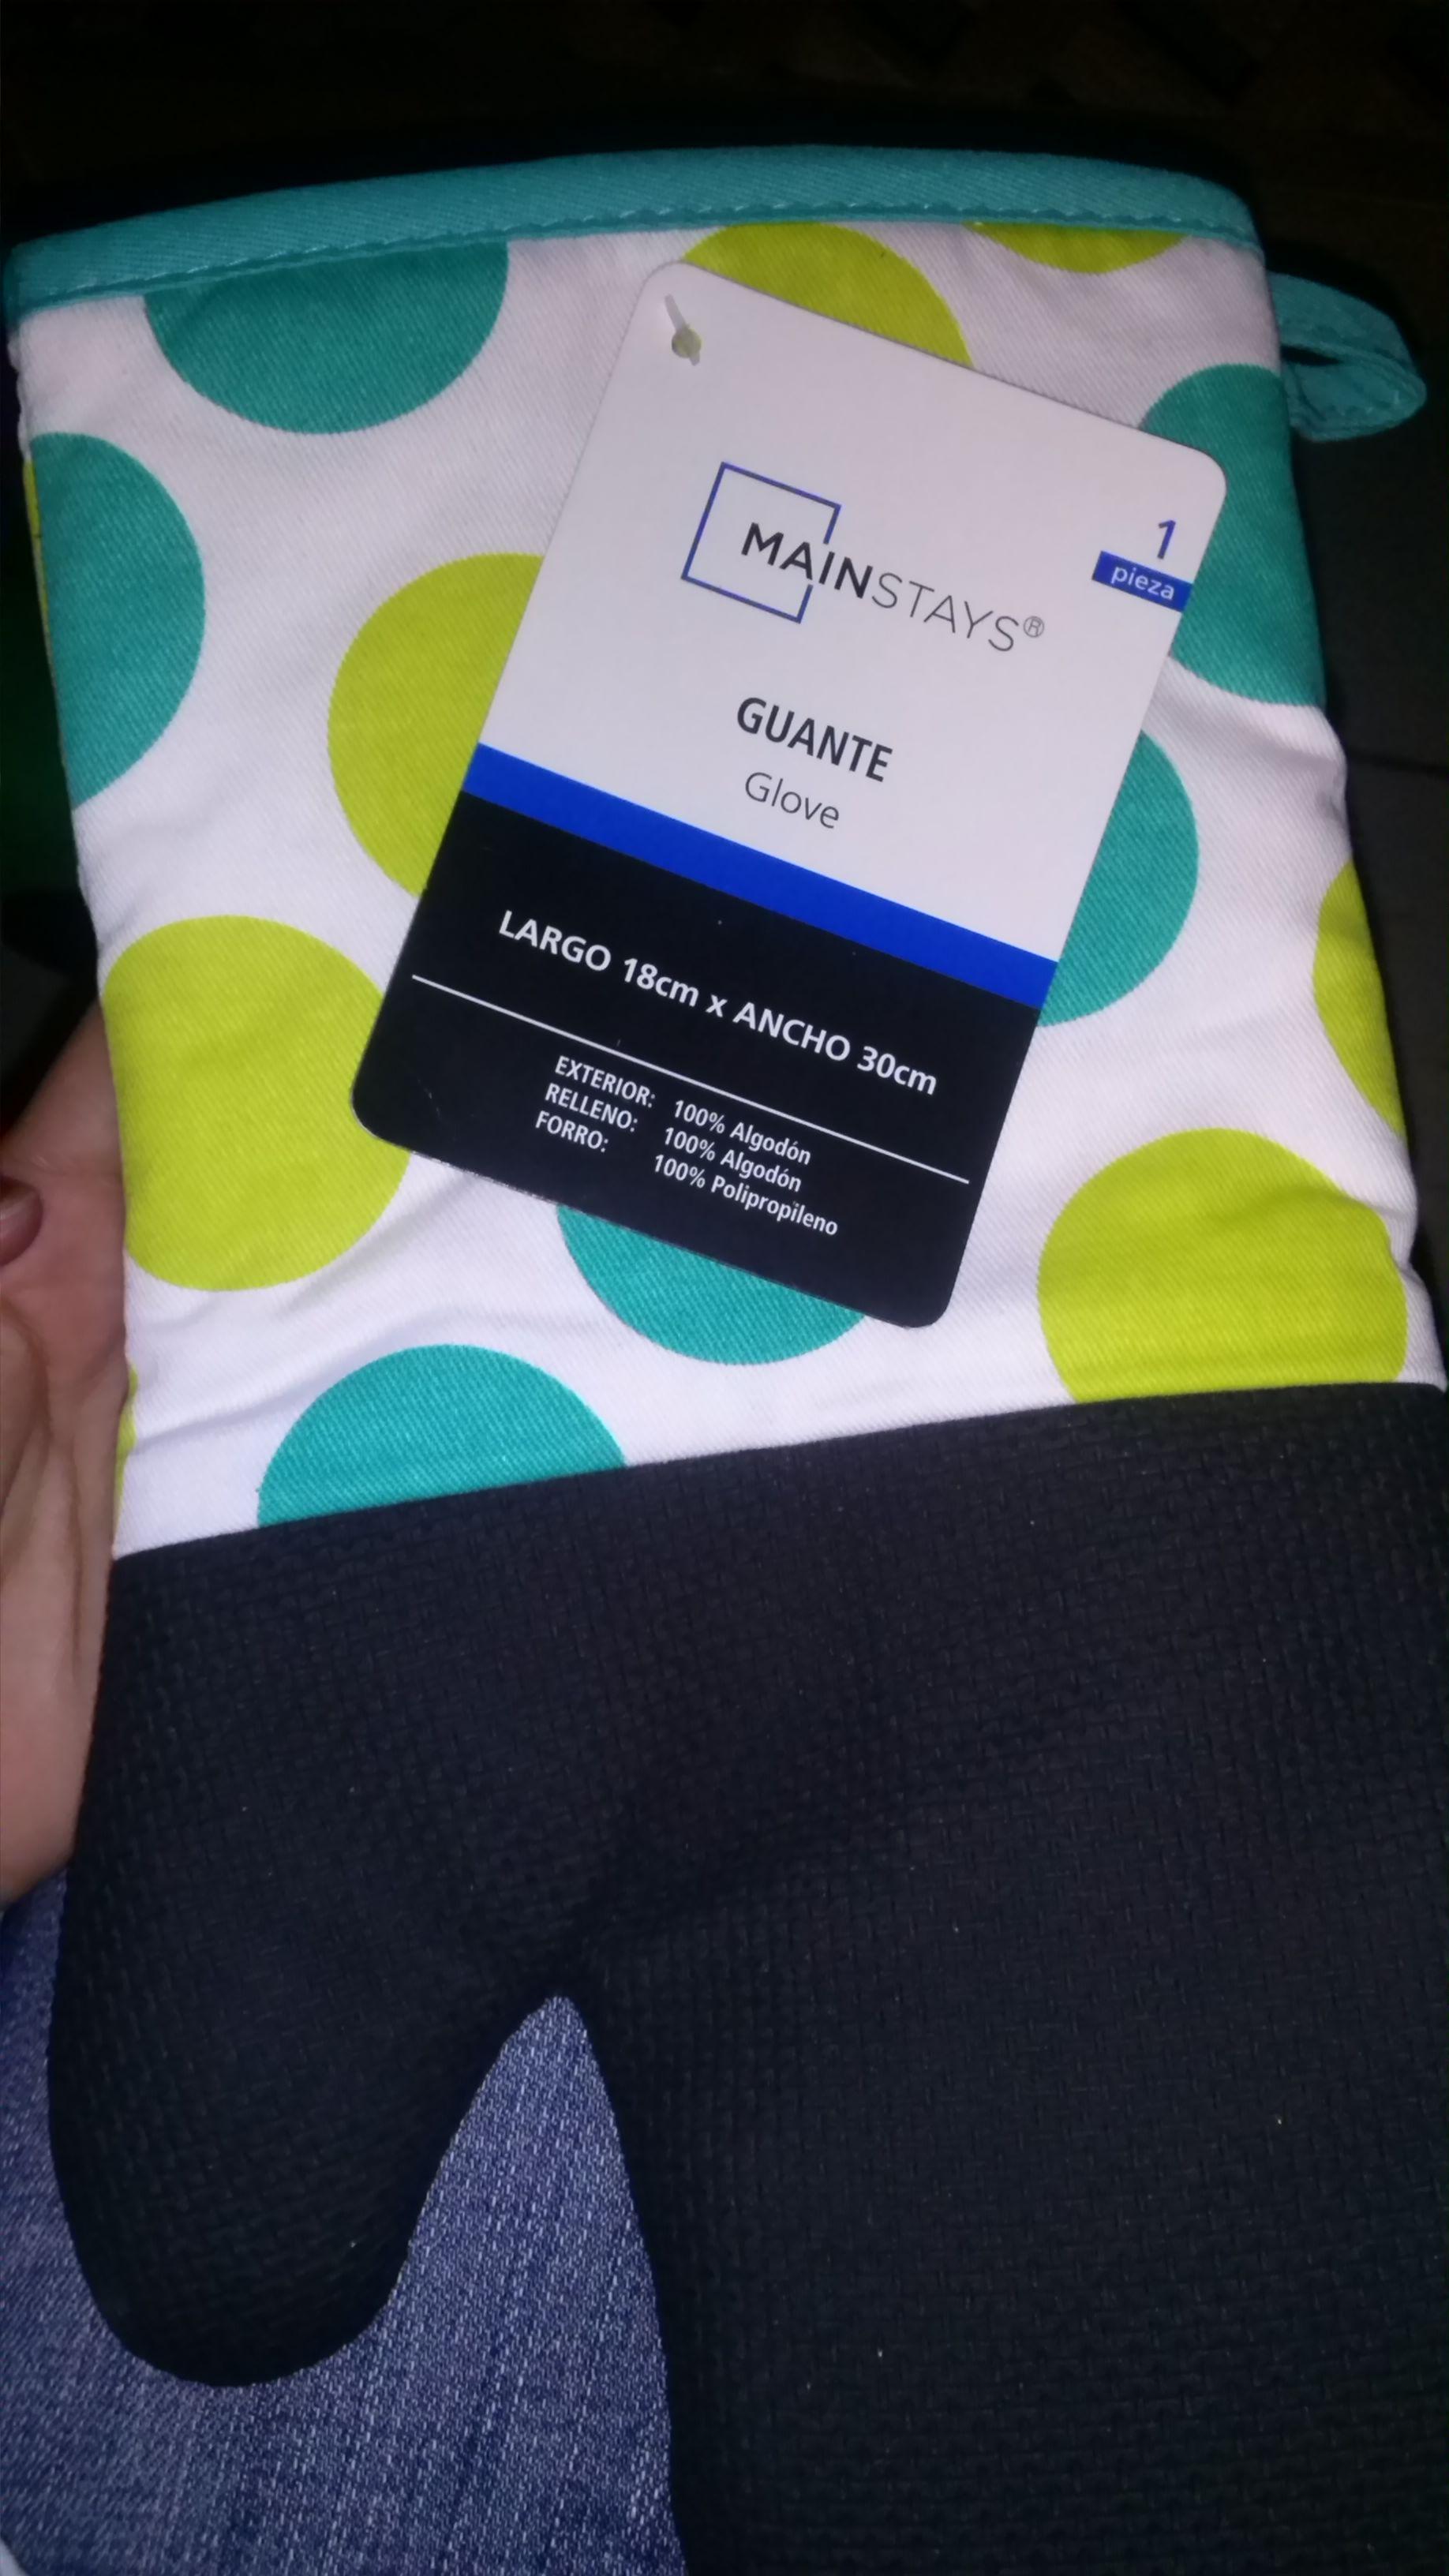 Walmart: guante de silicon